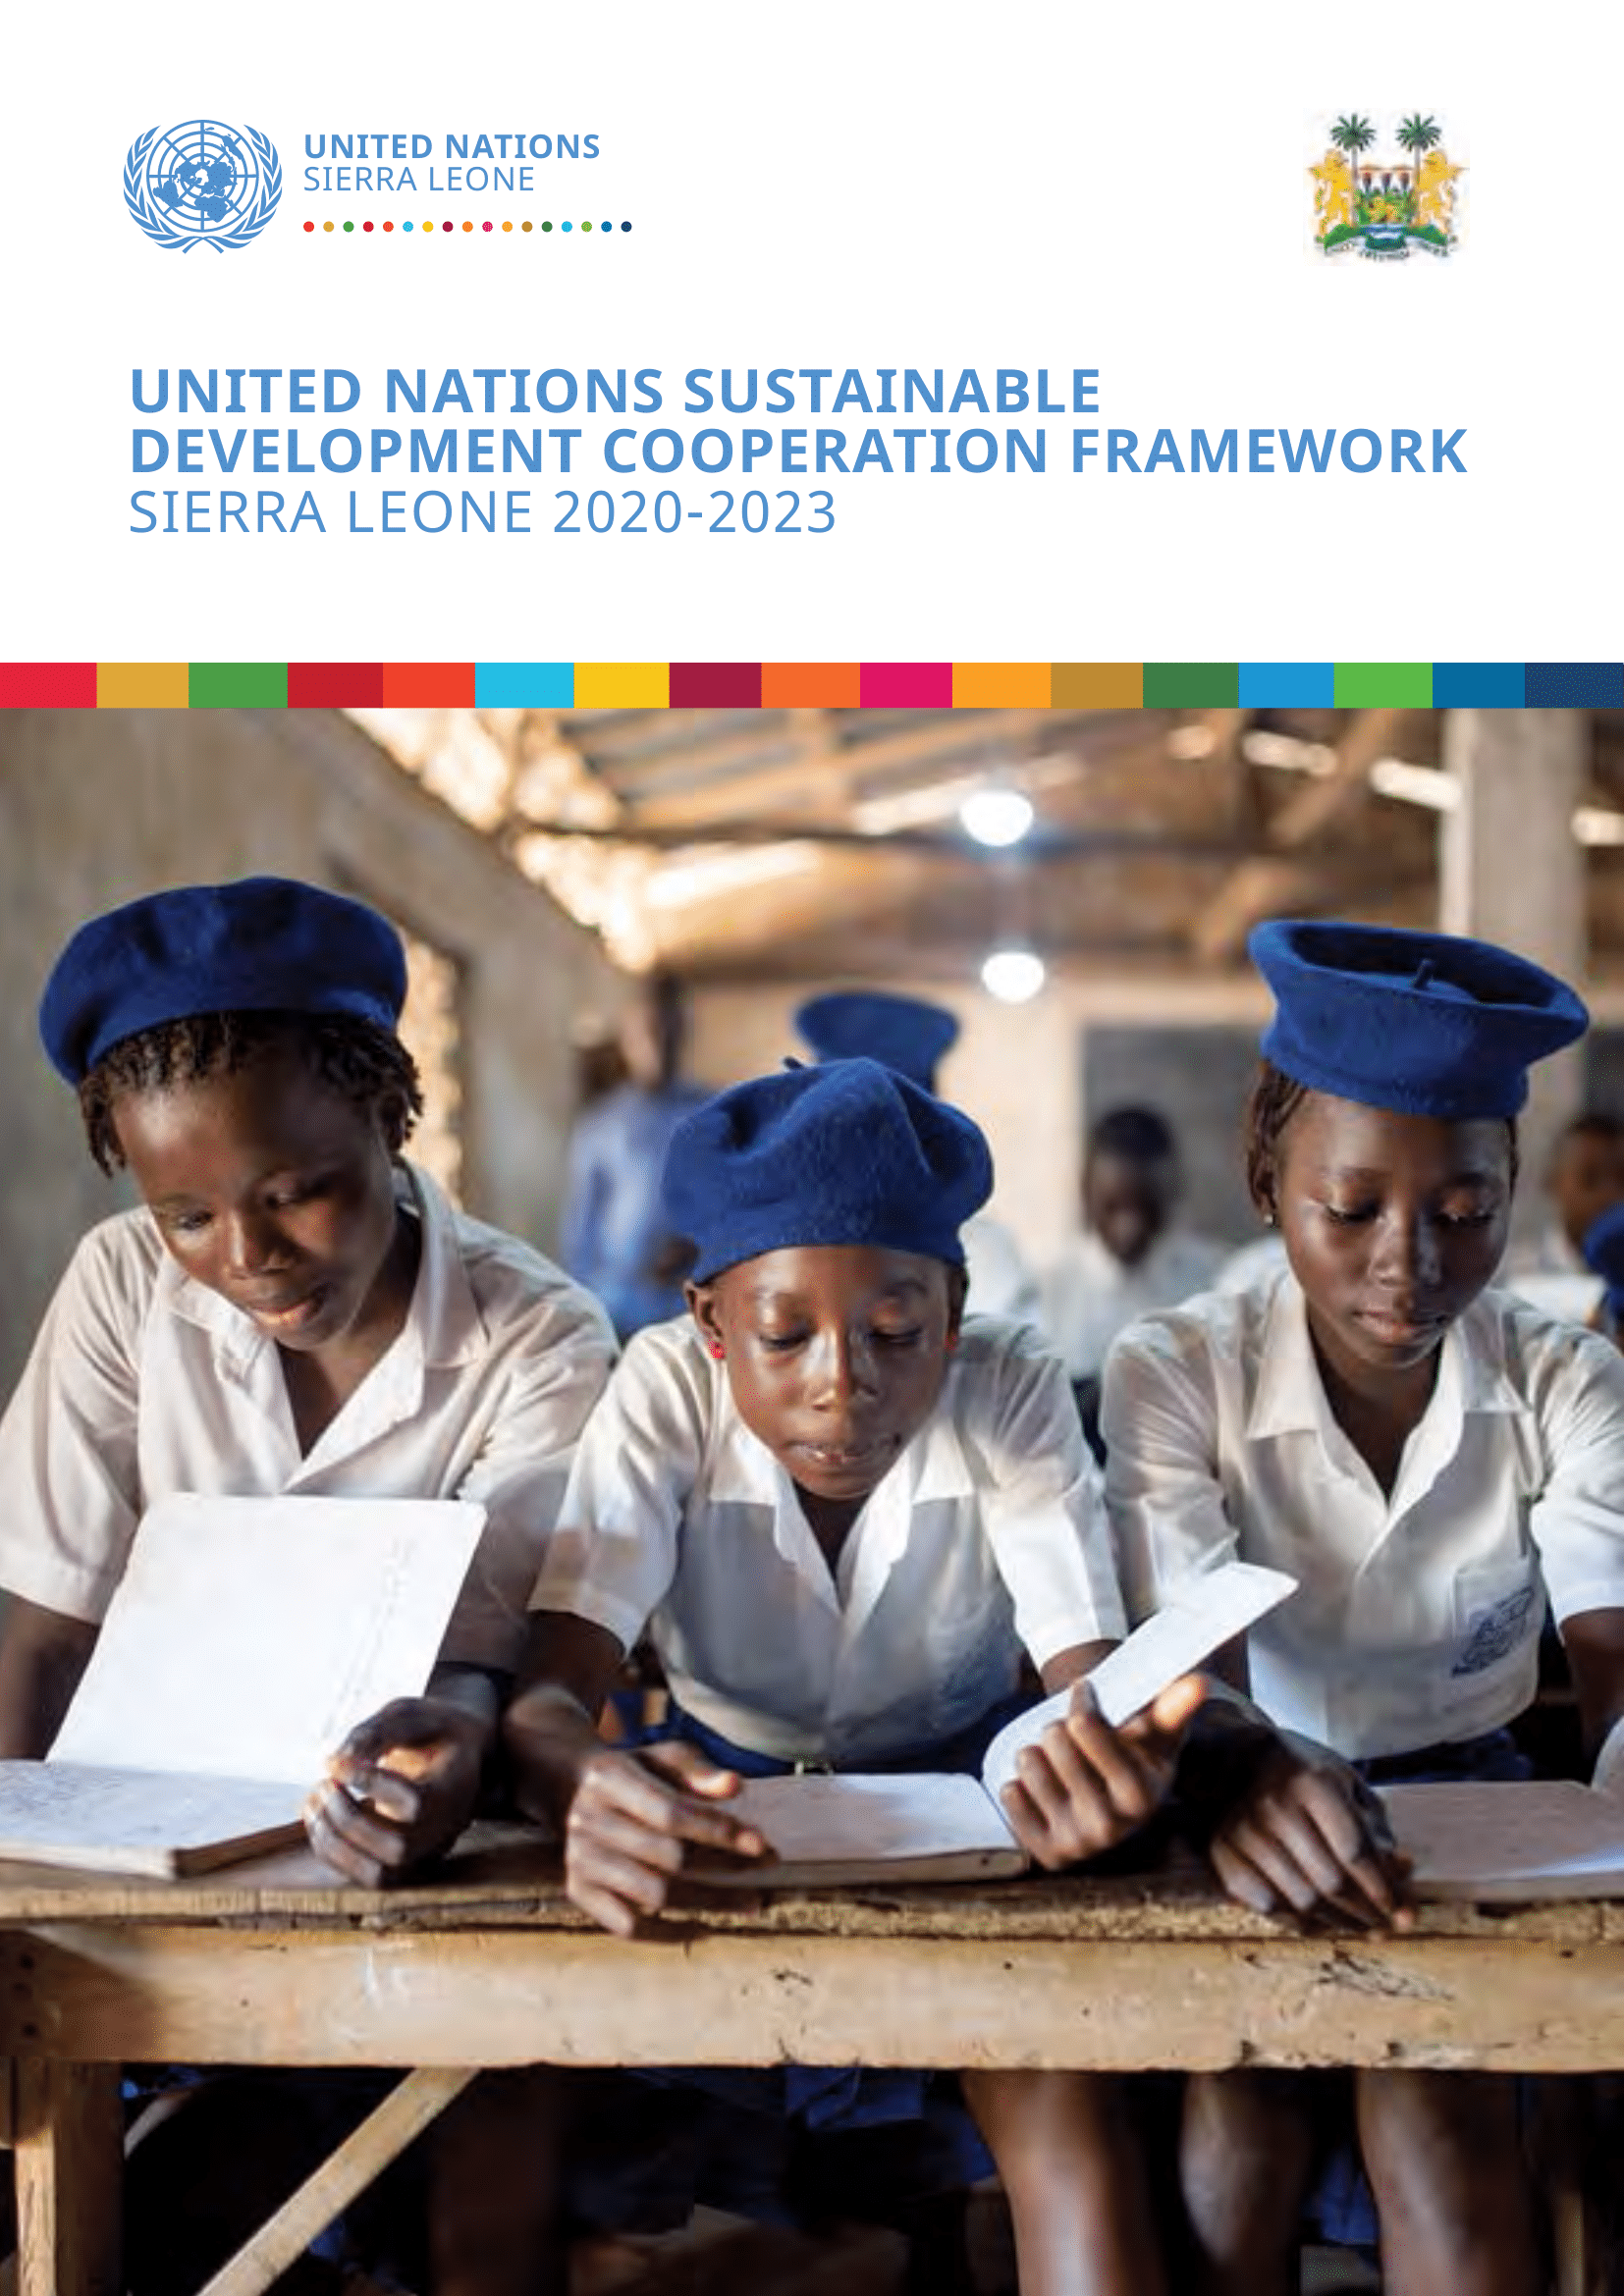 United Nations Sustainable Development Cooperation Framework Sierra Leone - 2020-2023